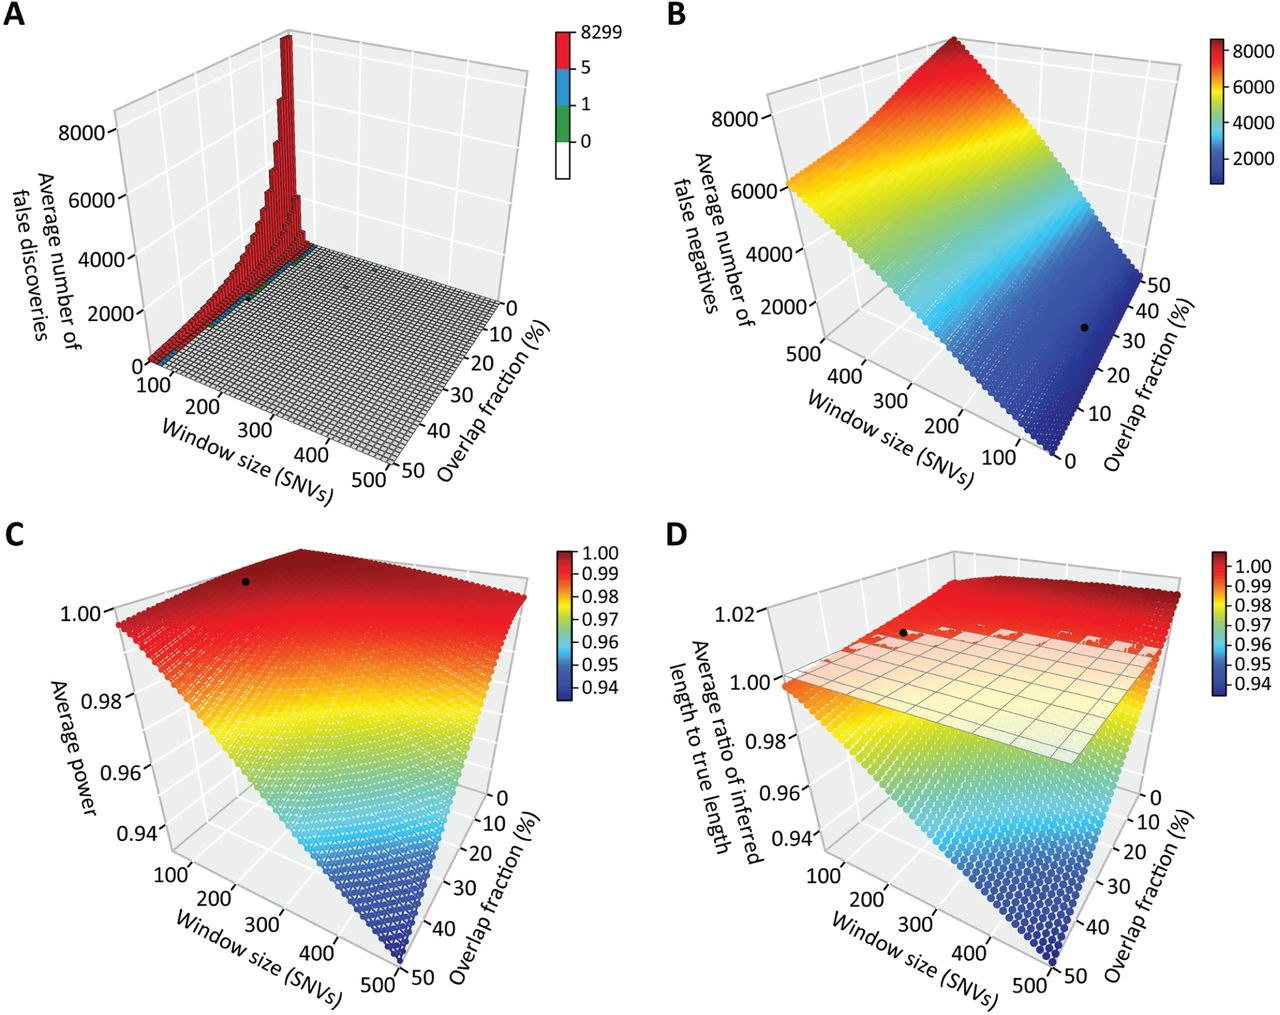 Weighted likelihood inference of genomic autozygosity